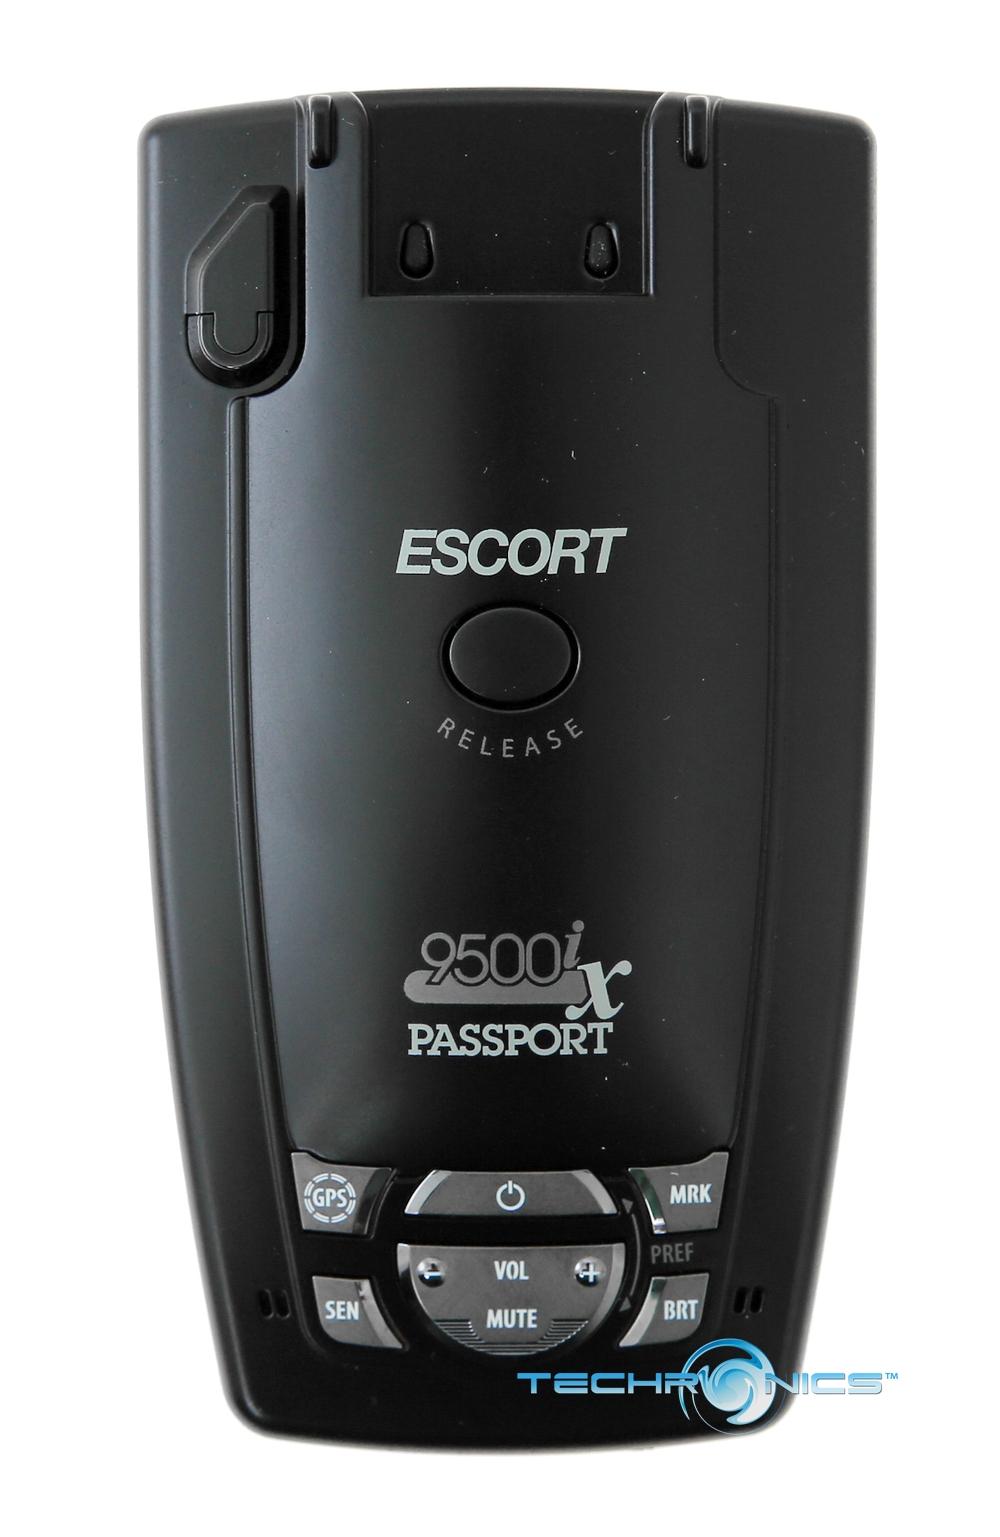 Passport Radar Detector >> ESCORT PASSPORT 9500IX RED CAR RADAR LASER DETECTOR AUTO LEARN INTELLIGENCE GPS